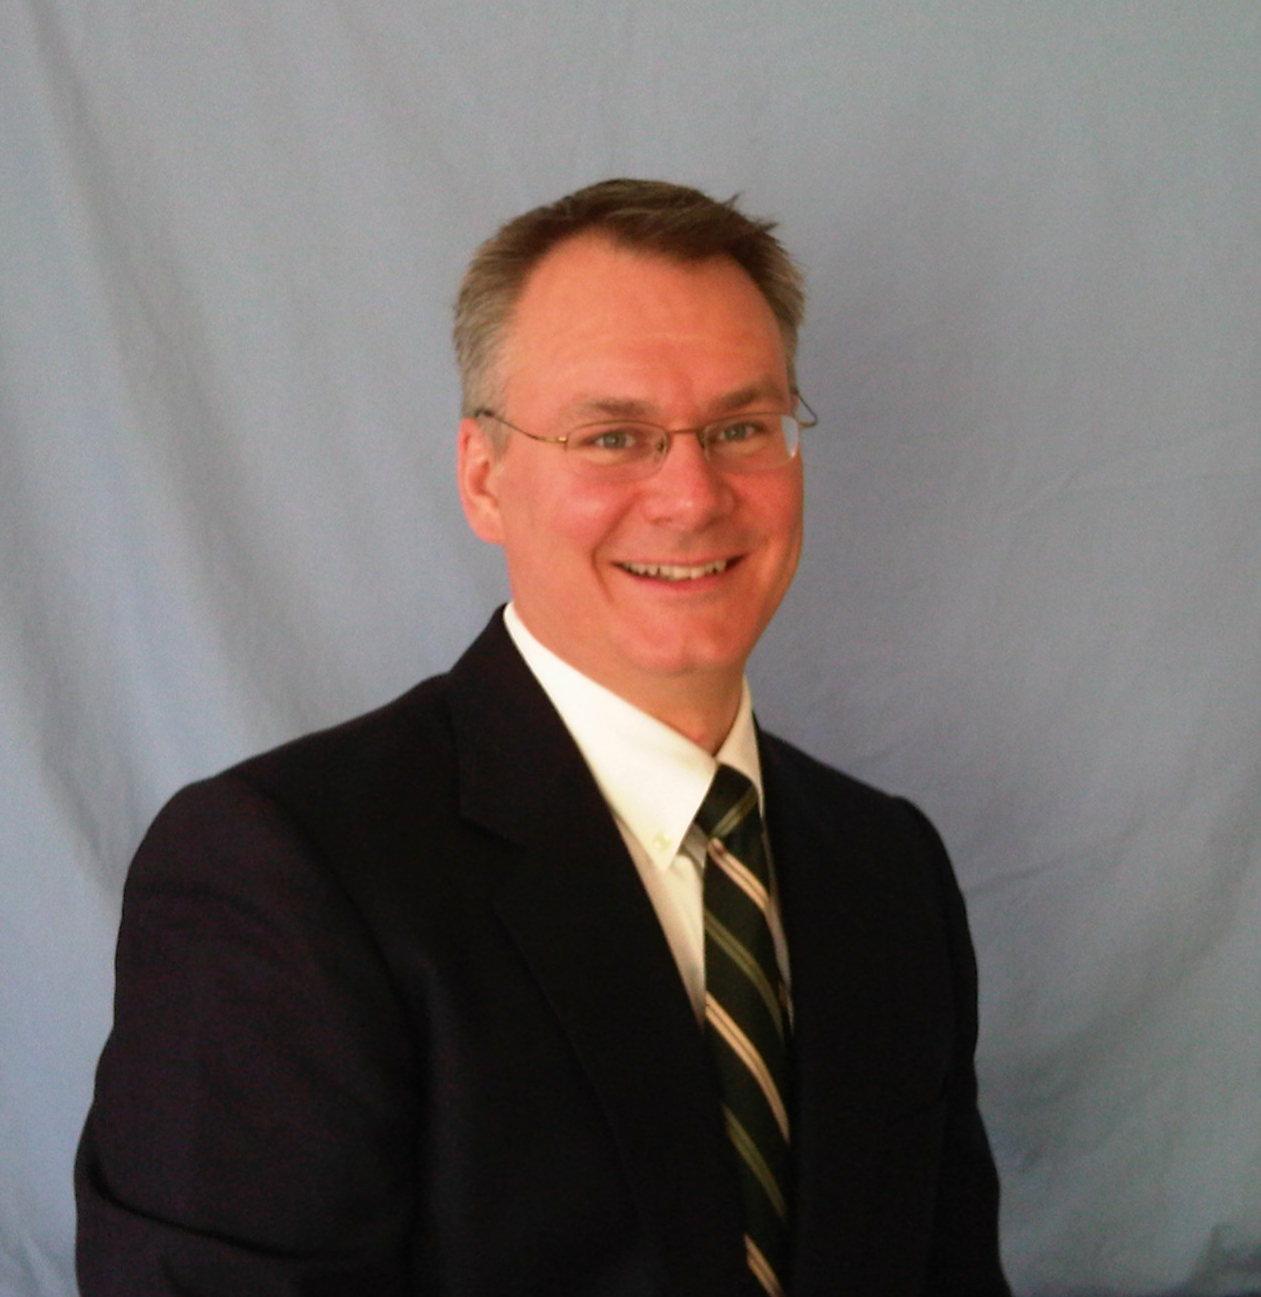 J. Patrick L. Magee, MBA, CFA, BA.HONS